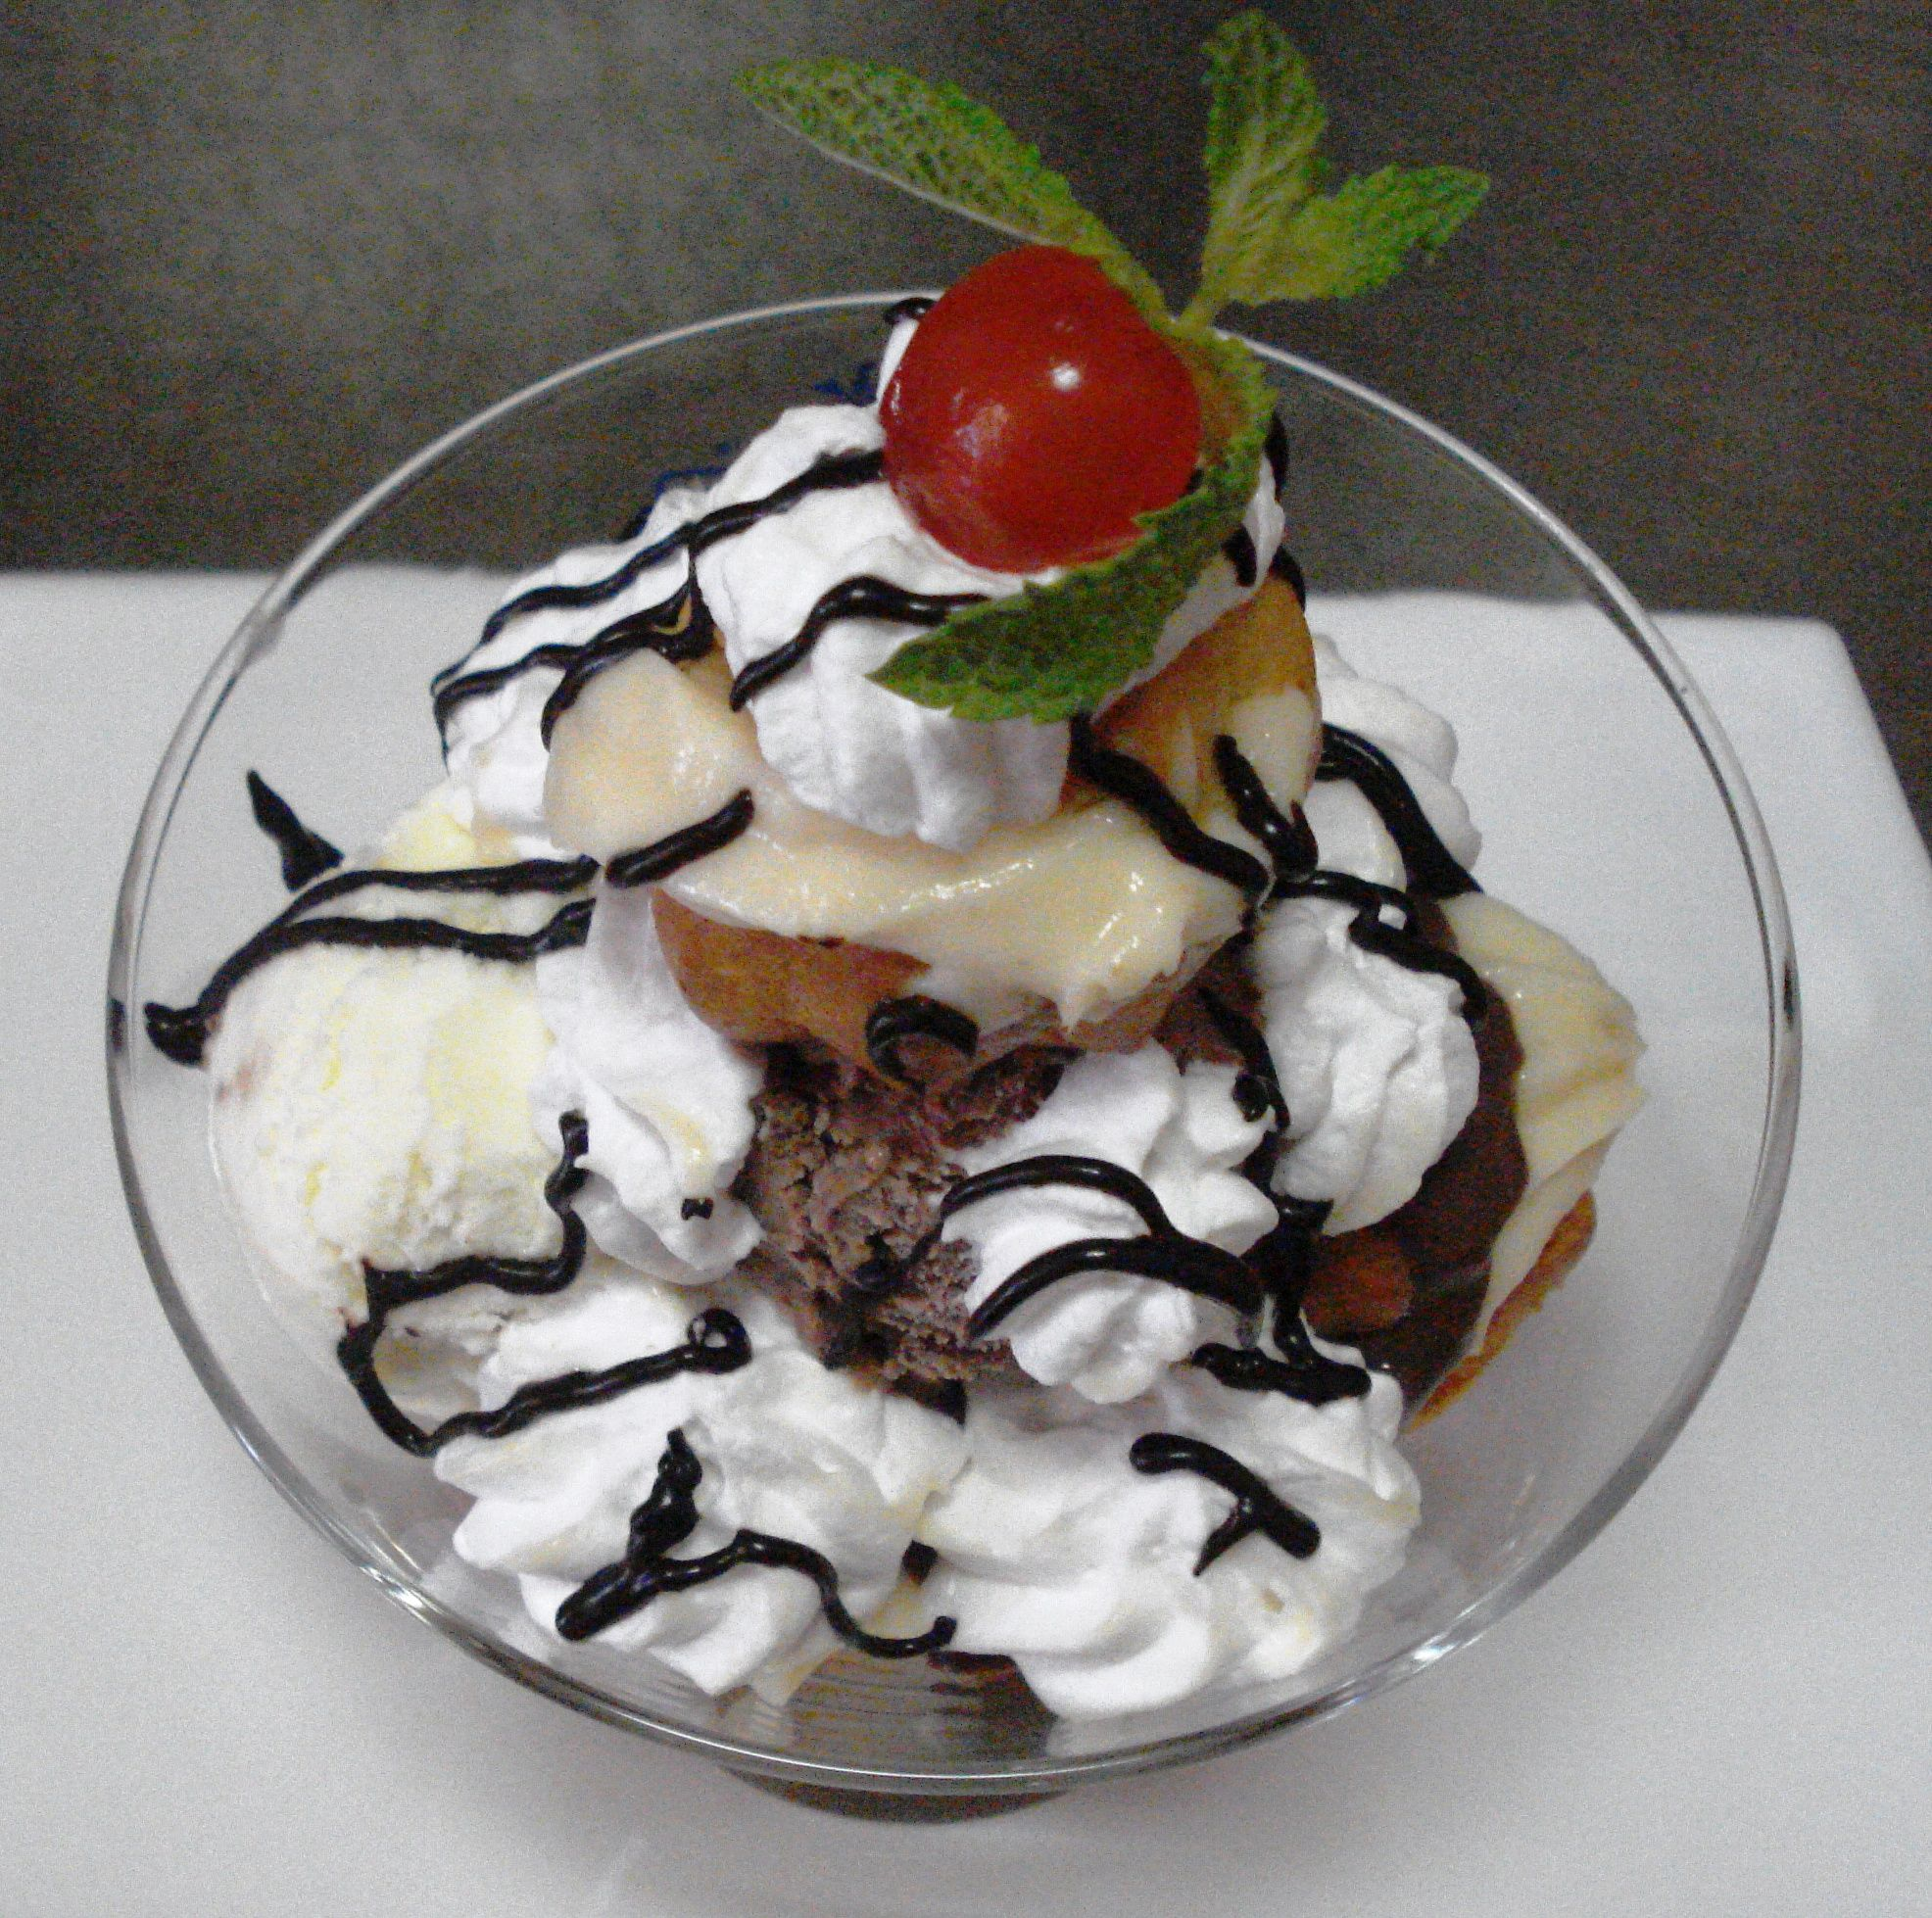 Profiterol Mon Cheri, cu minieclere de casa, crema de vanilie, crema de ciocolata si inghetata asortata !!! O adevarata nebunie!!!